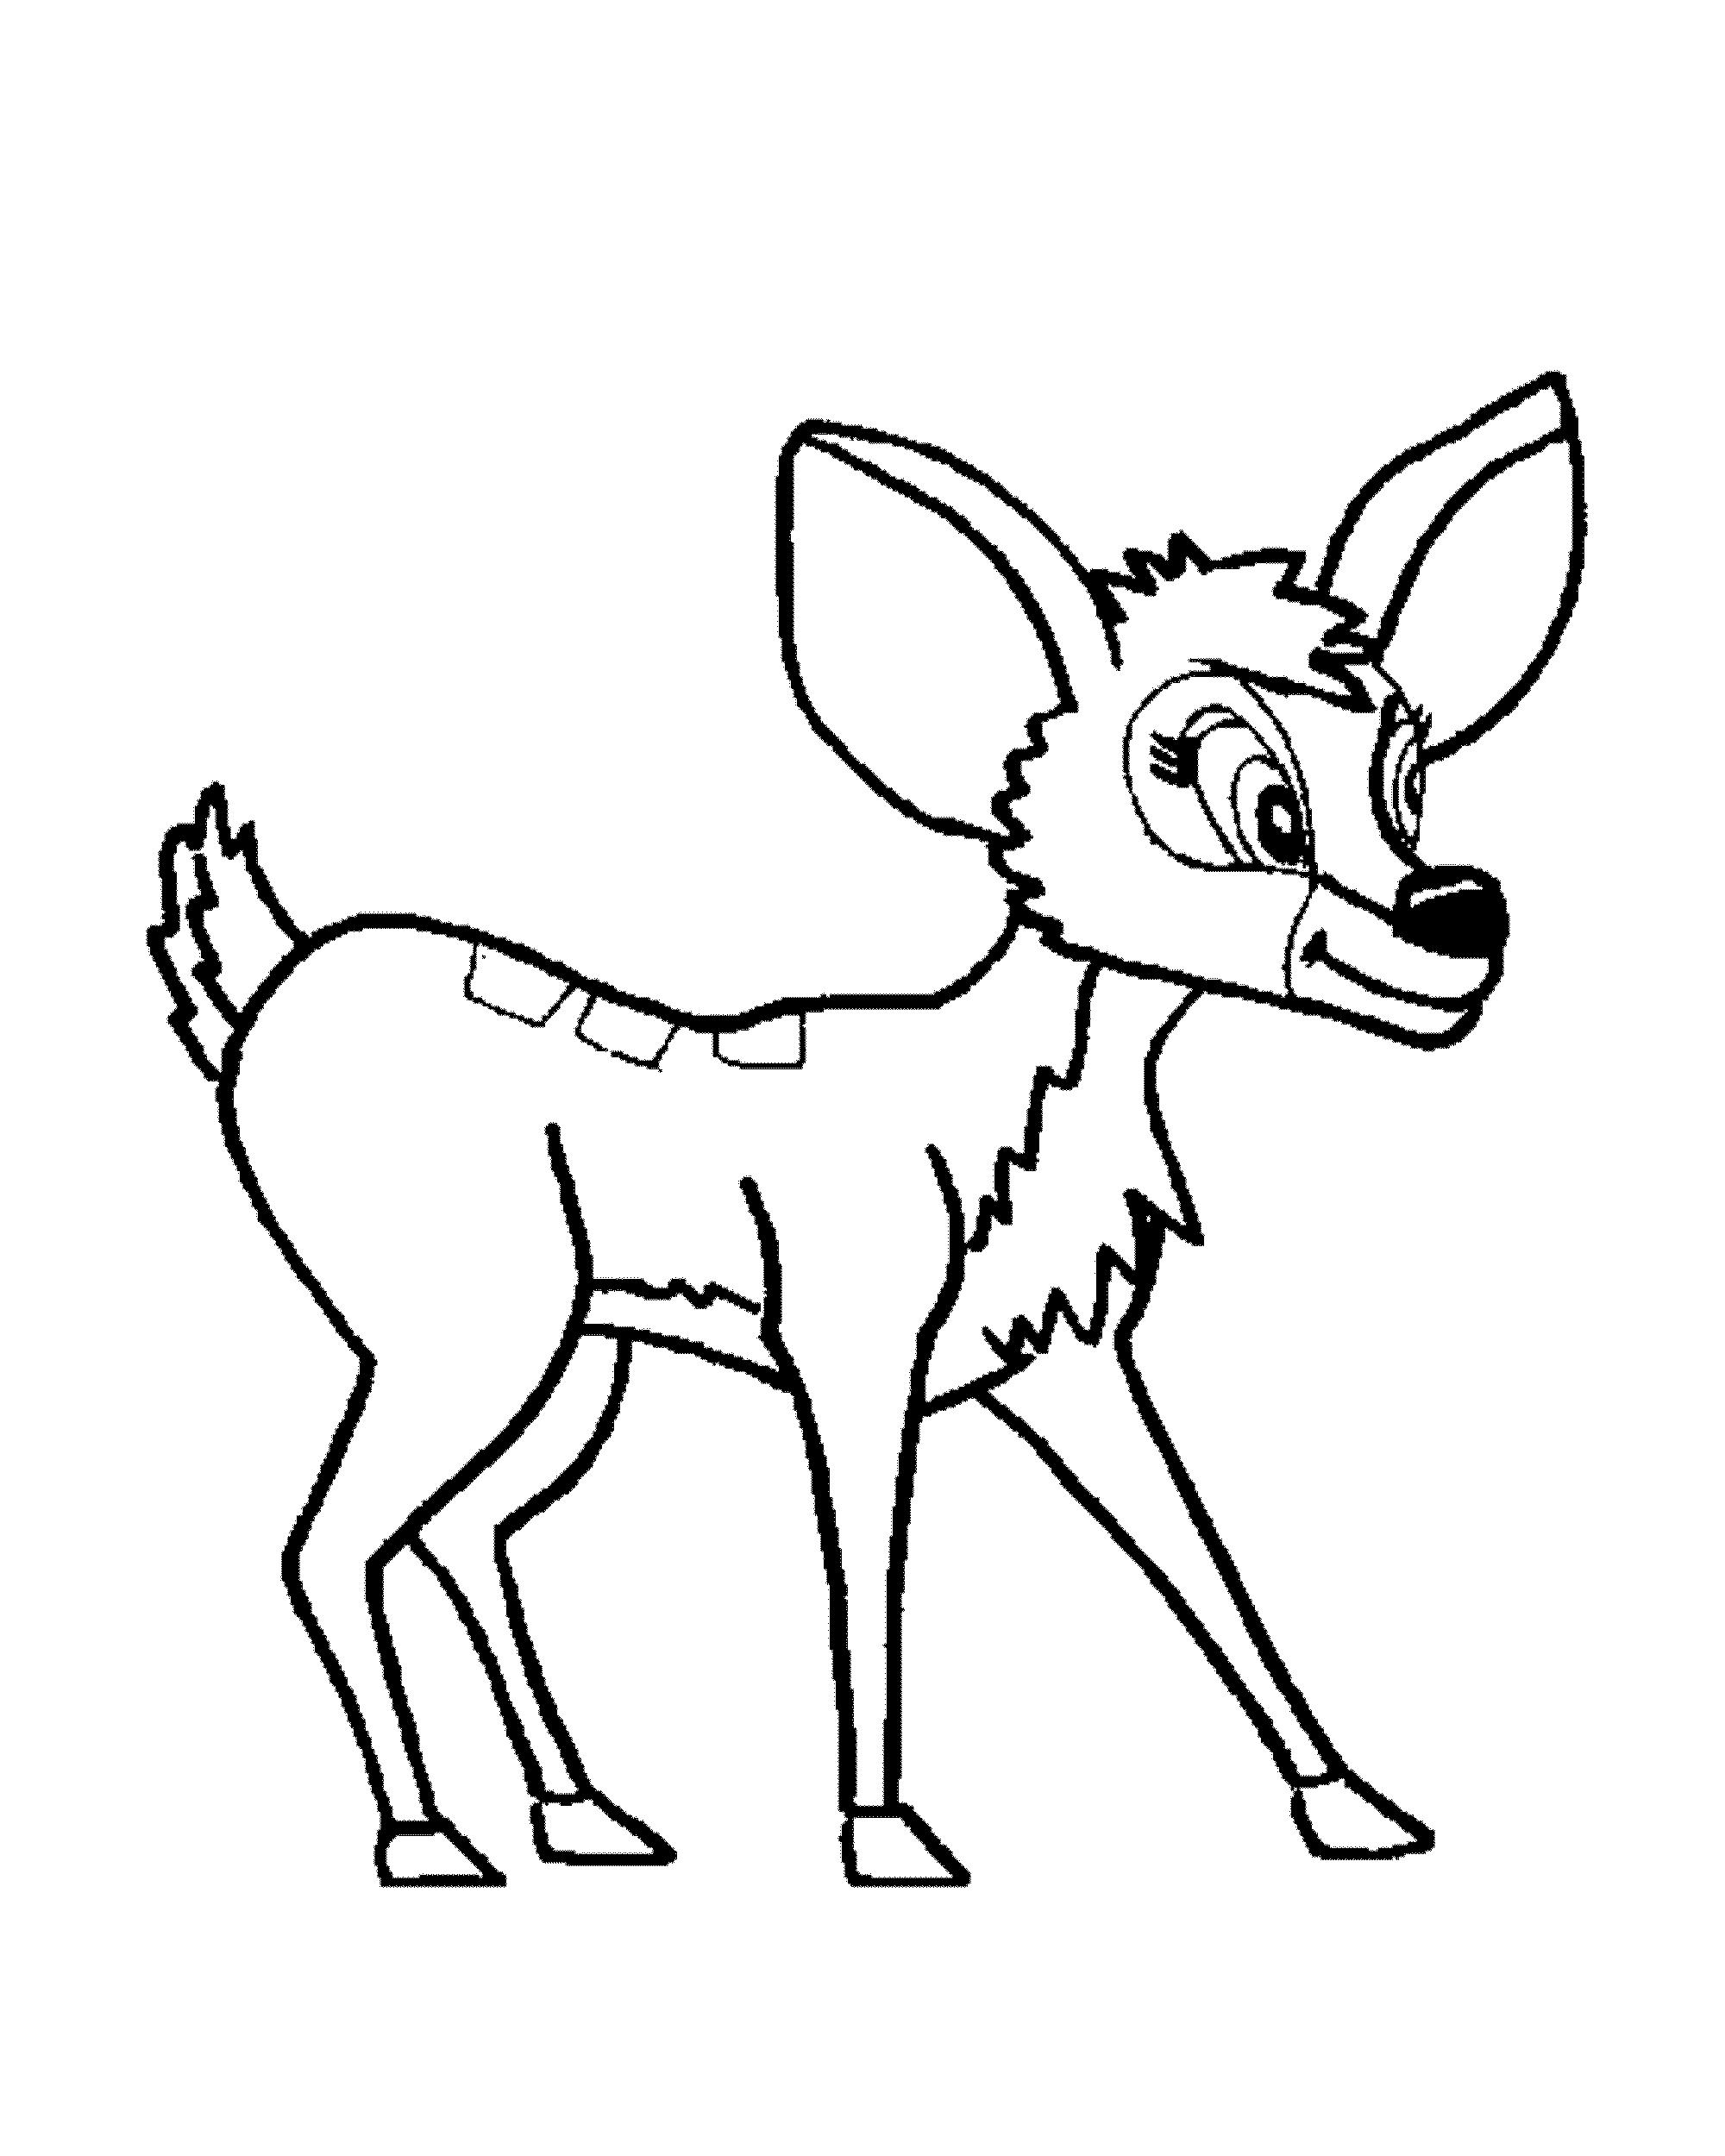 buck coloring pages print download deer coloring pages for totally coloring buck pages